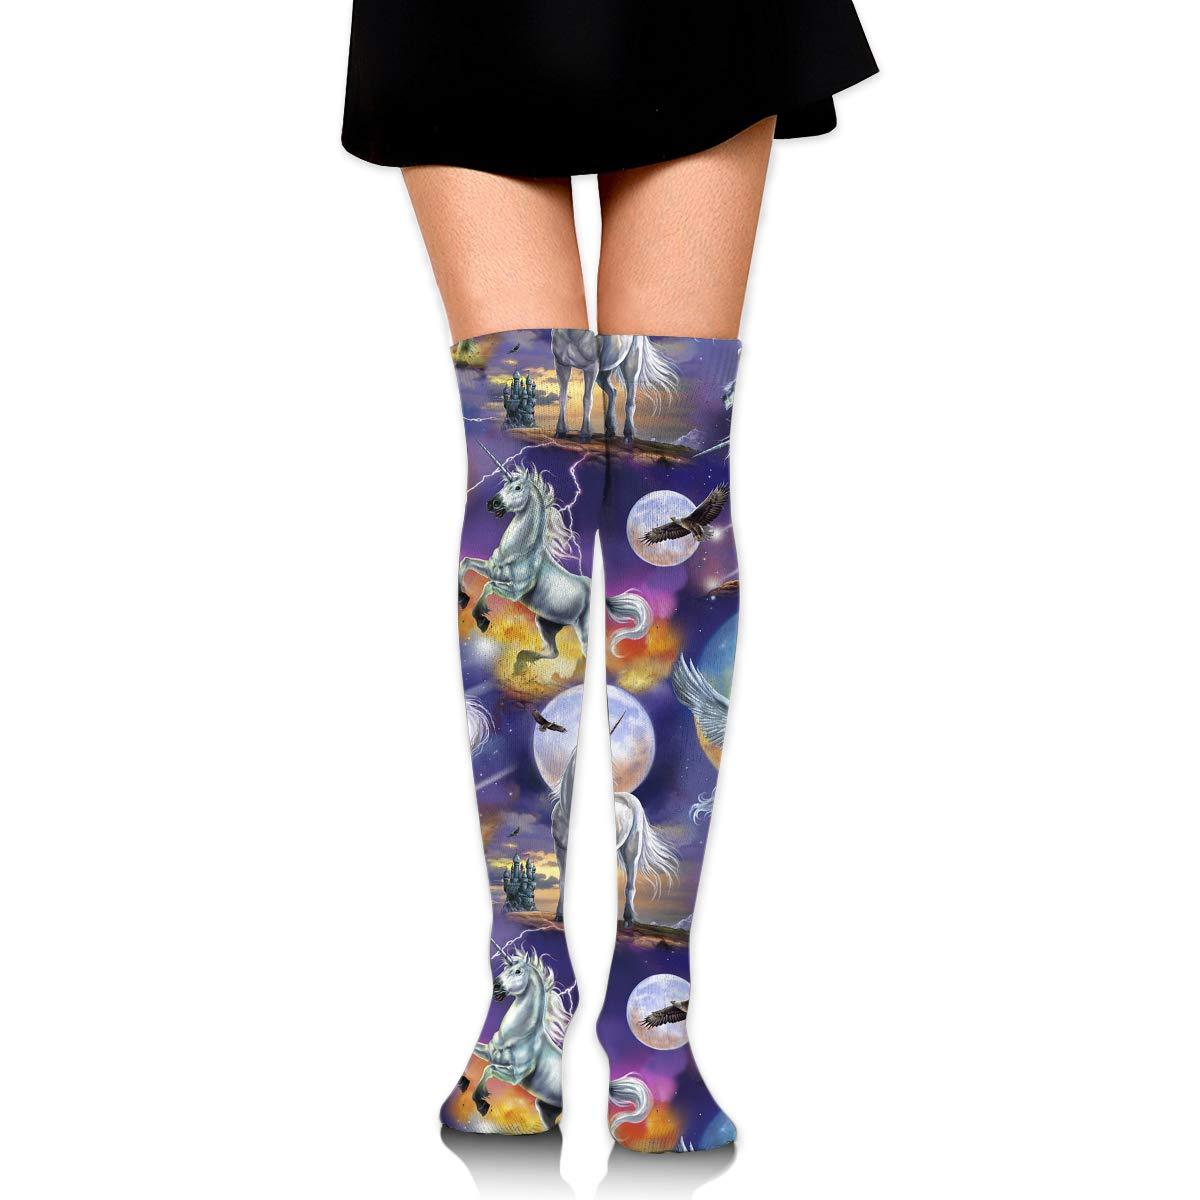 High Elasticity Girl Cotton Knee High Socks Uniform Moon Unicorn Women Tube Socks